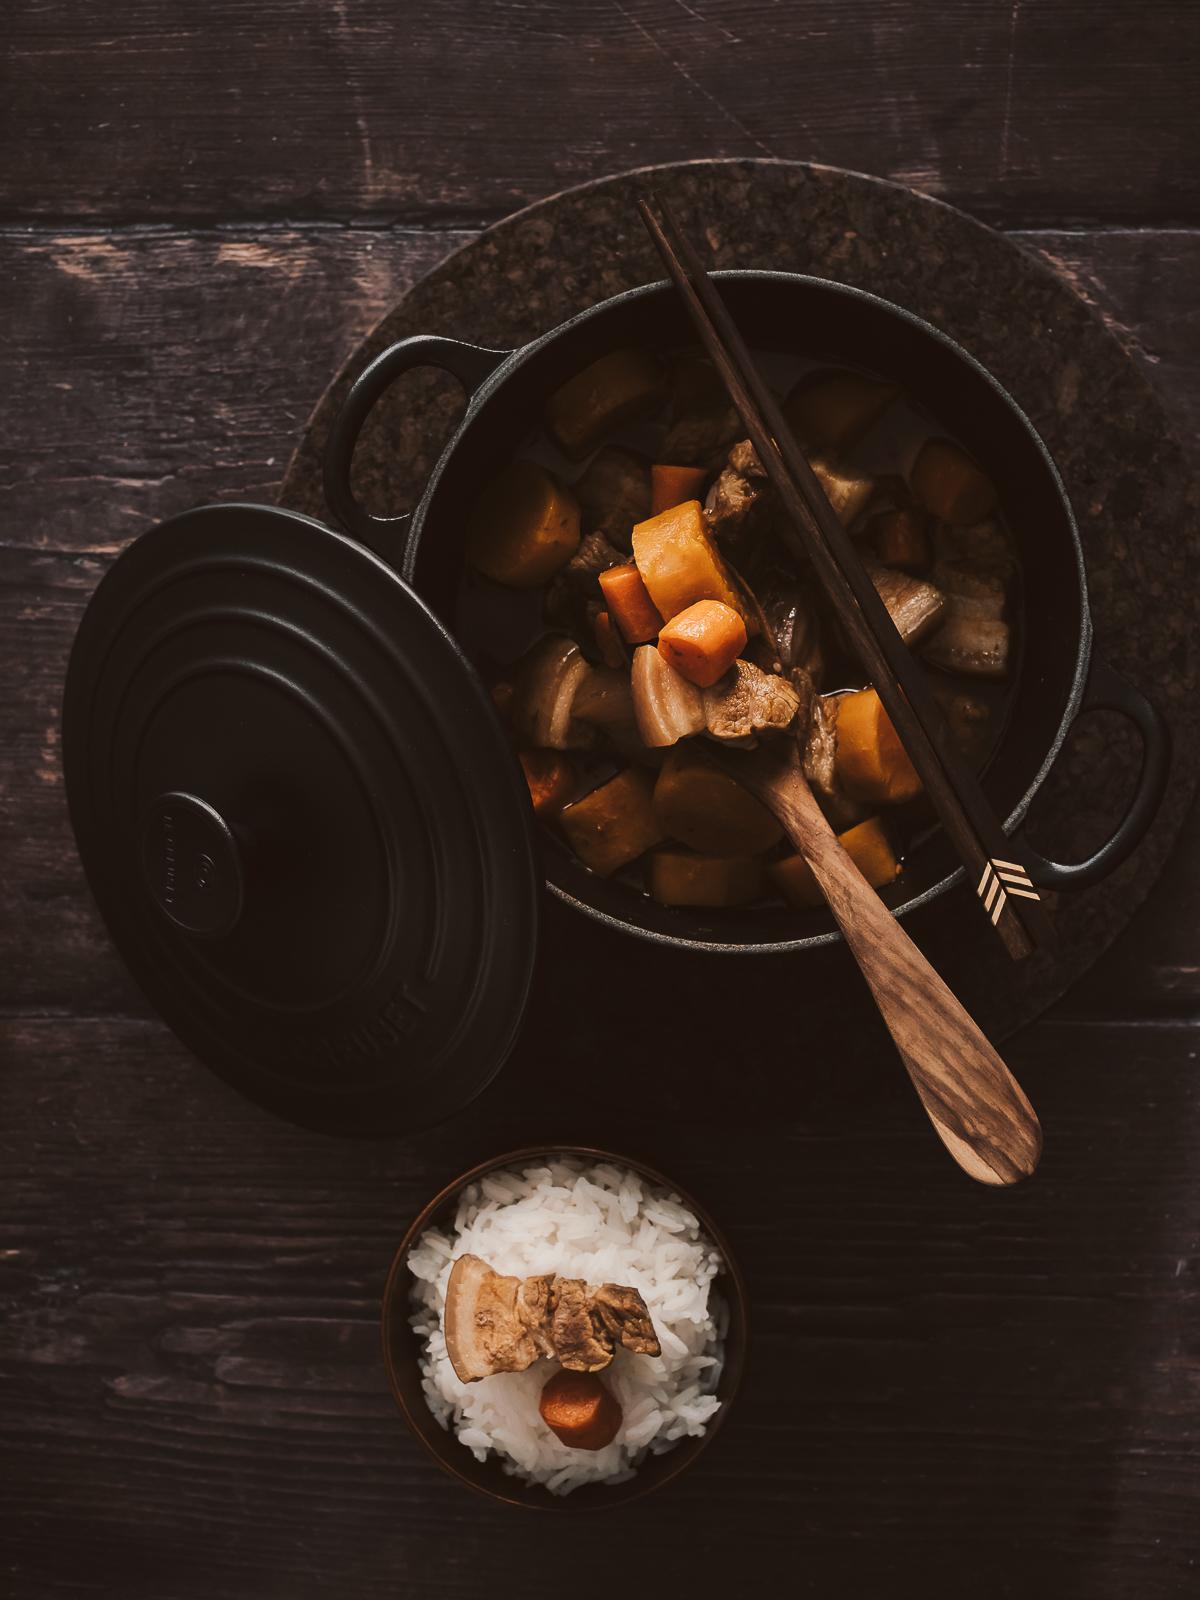 Ingolstadt Village Chinese New Year Lifestyle Shopping & Home Cooking - Olympus EM1Markii 2512 - Yes! Please Enjoy by Fanning Tseng-114.jpg